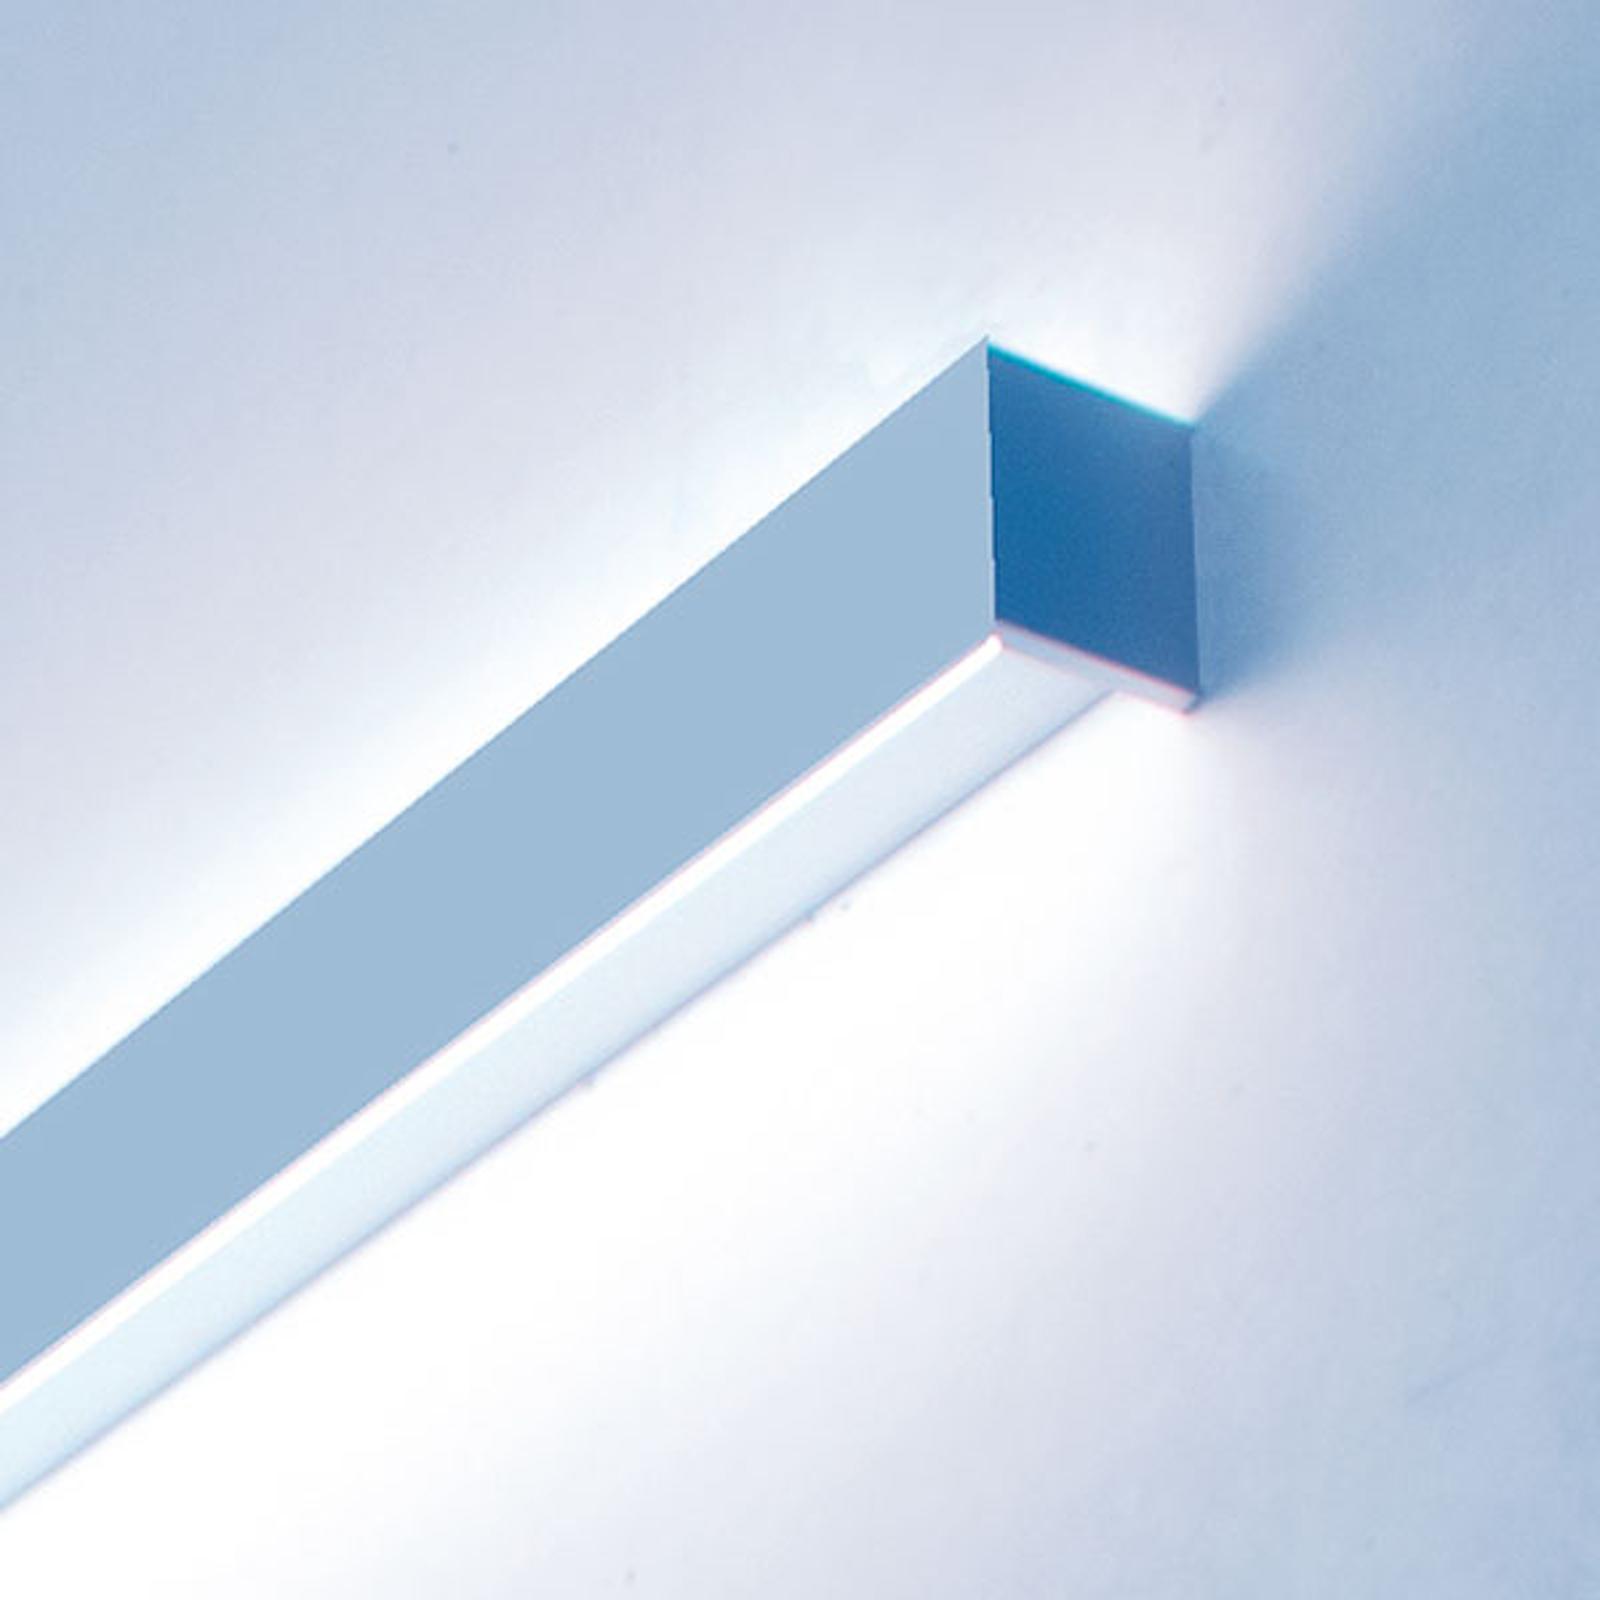 Matric W1 LED-vegglampe i 235 cm, 4000 K